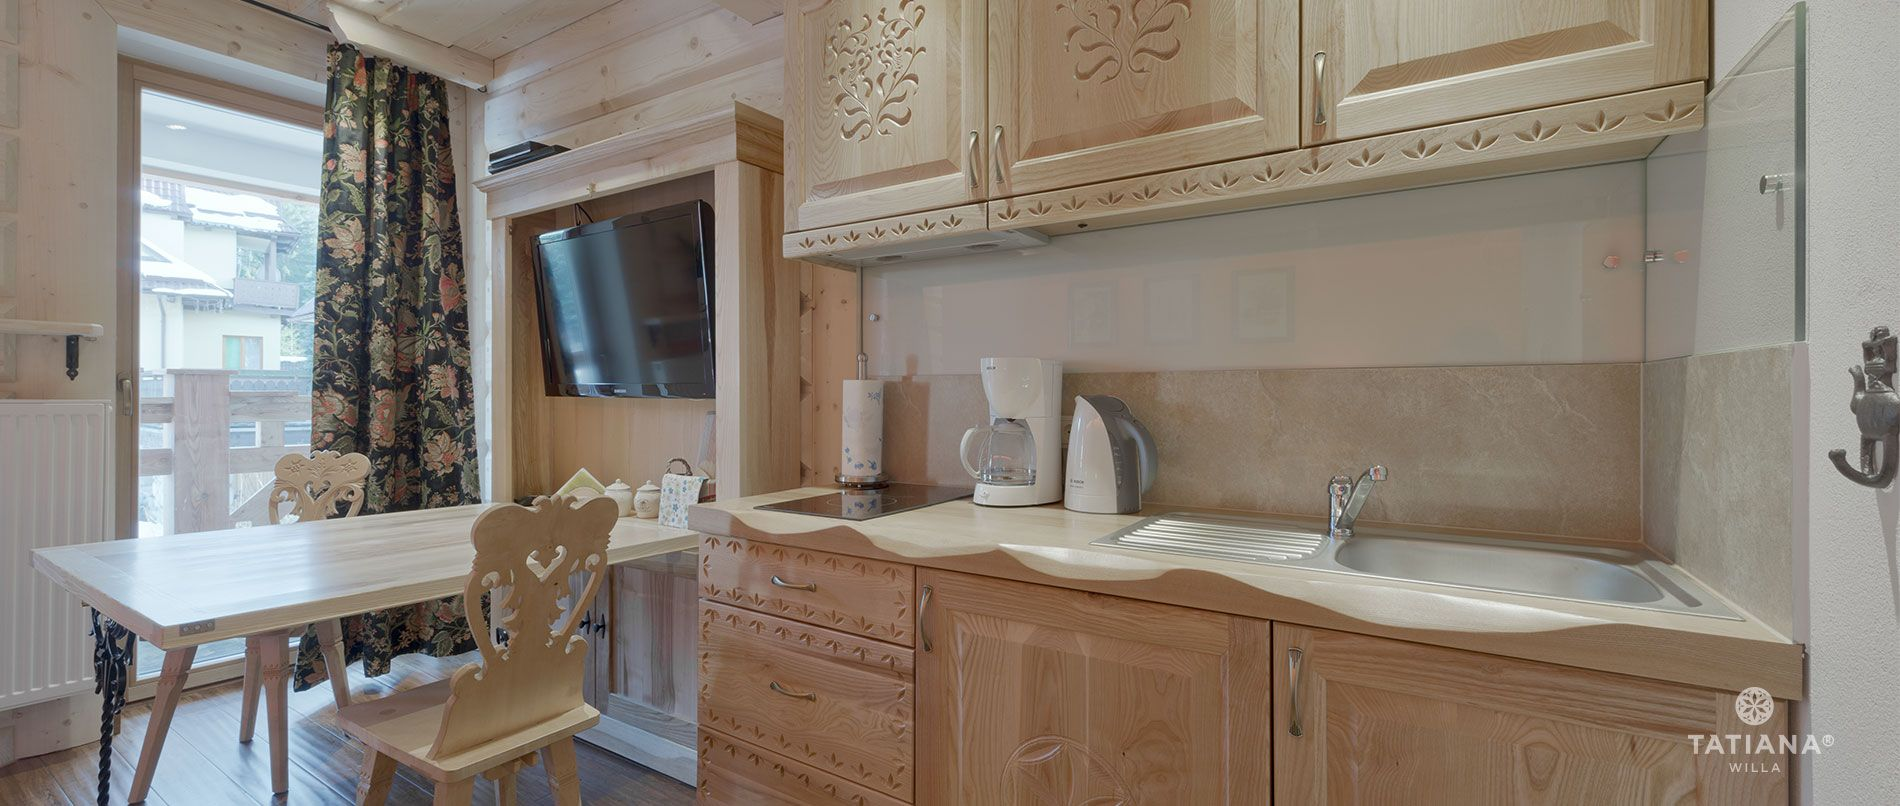 Apartament Lux10- aneks kuchenny